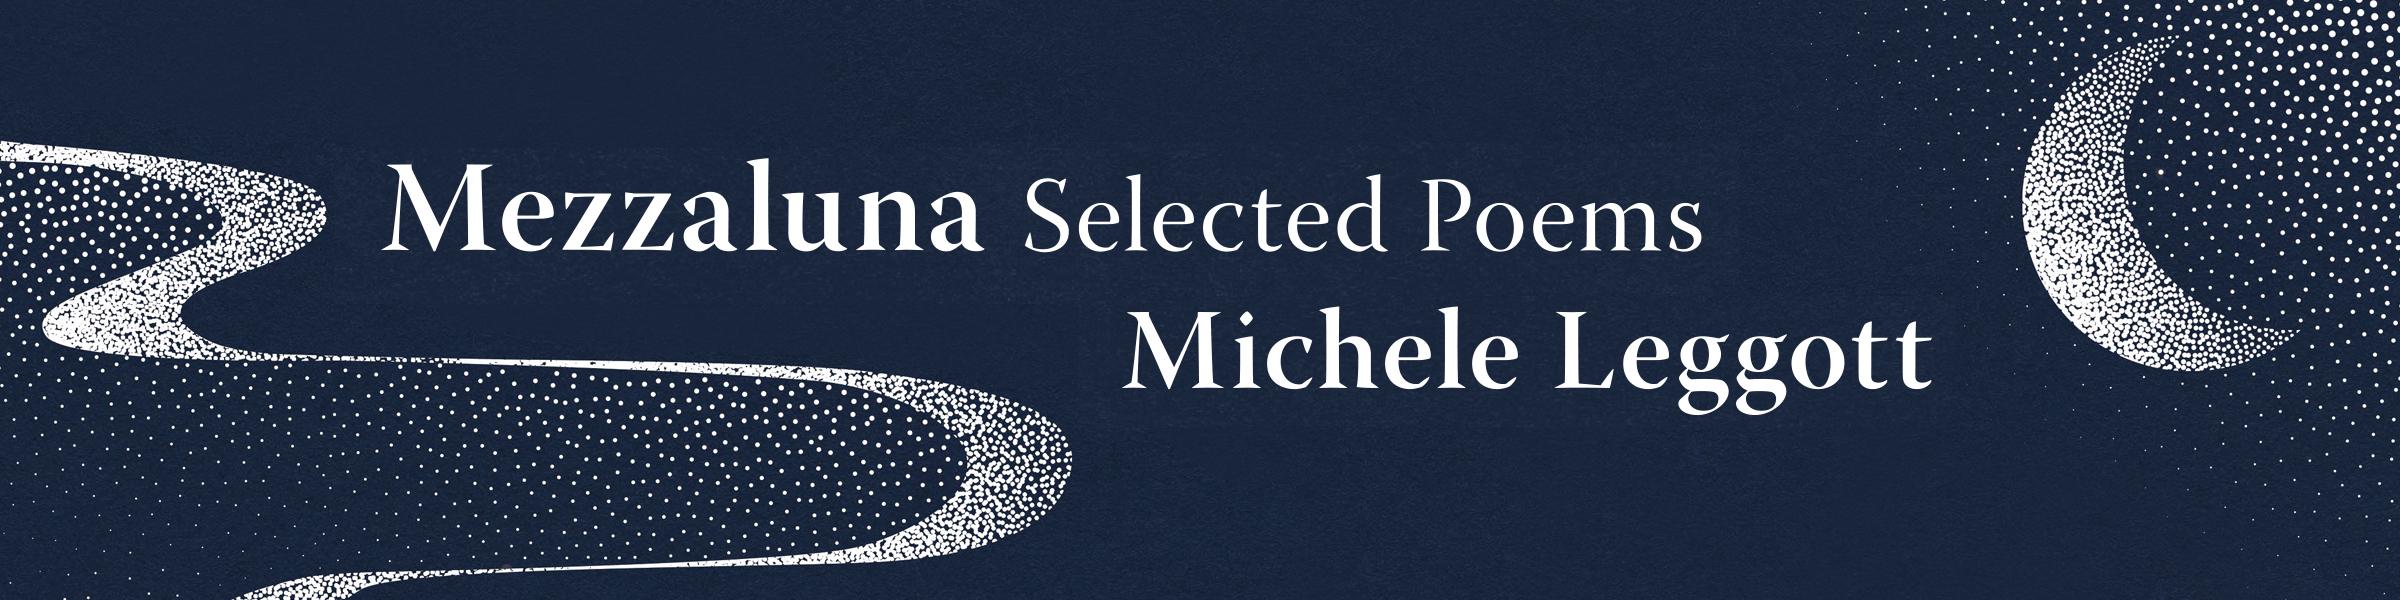 MEZZALUNA: SELECTED POEMS by Michele Leggott